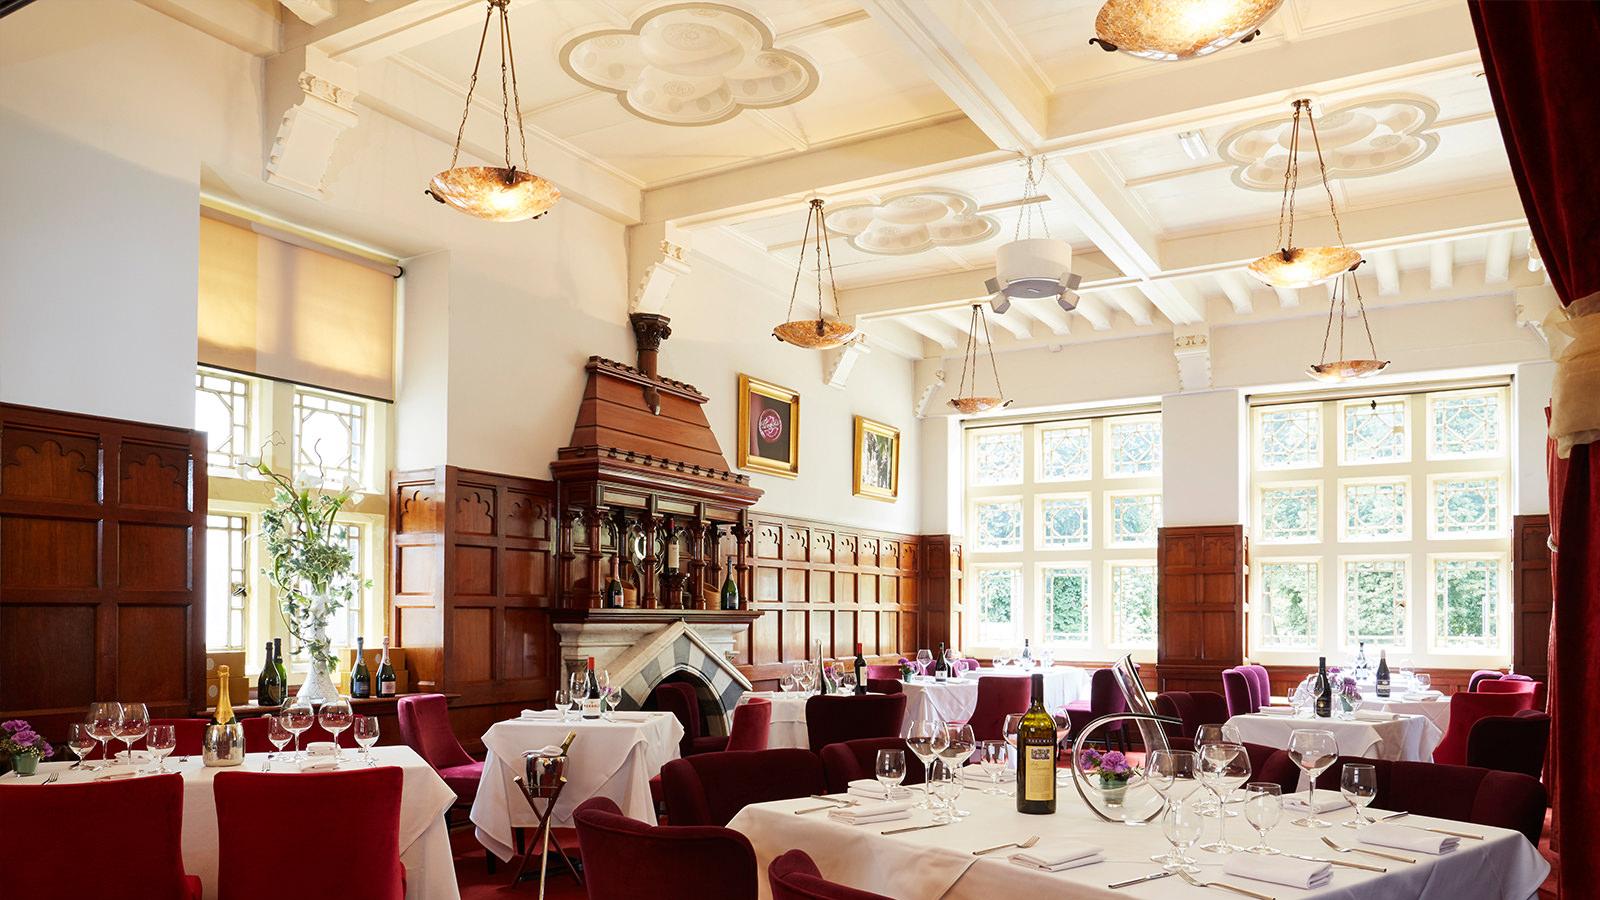 Park House  Fine Dining Restaurant  Cardiff  Cond Nast